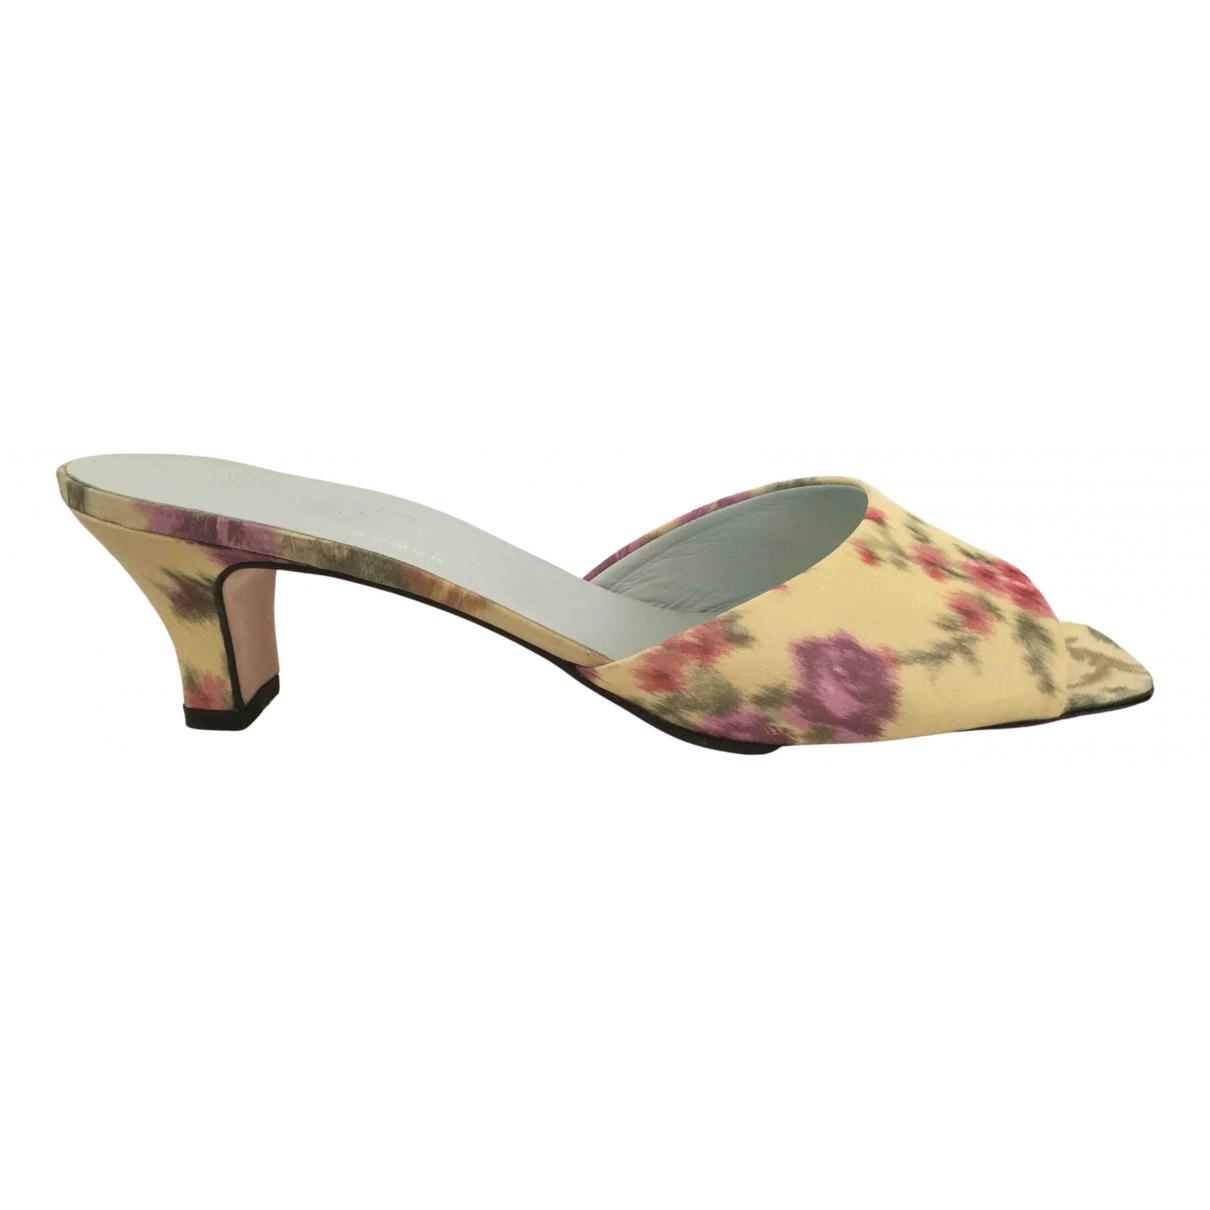 Emma Hope N Multicolour Leather Sandals for Women 39.5 EU